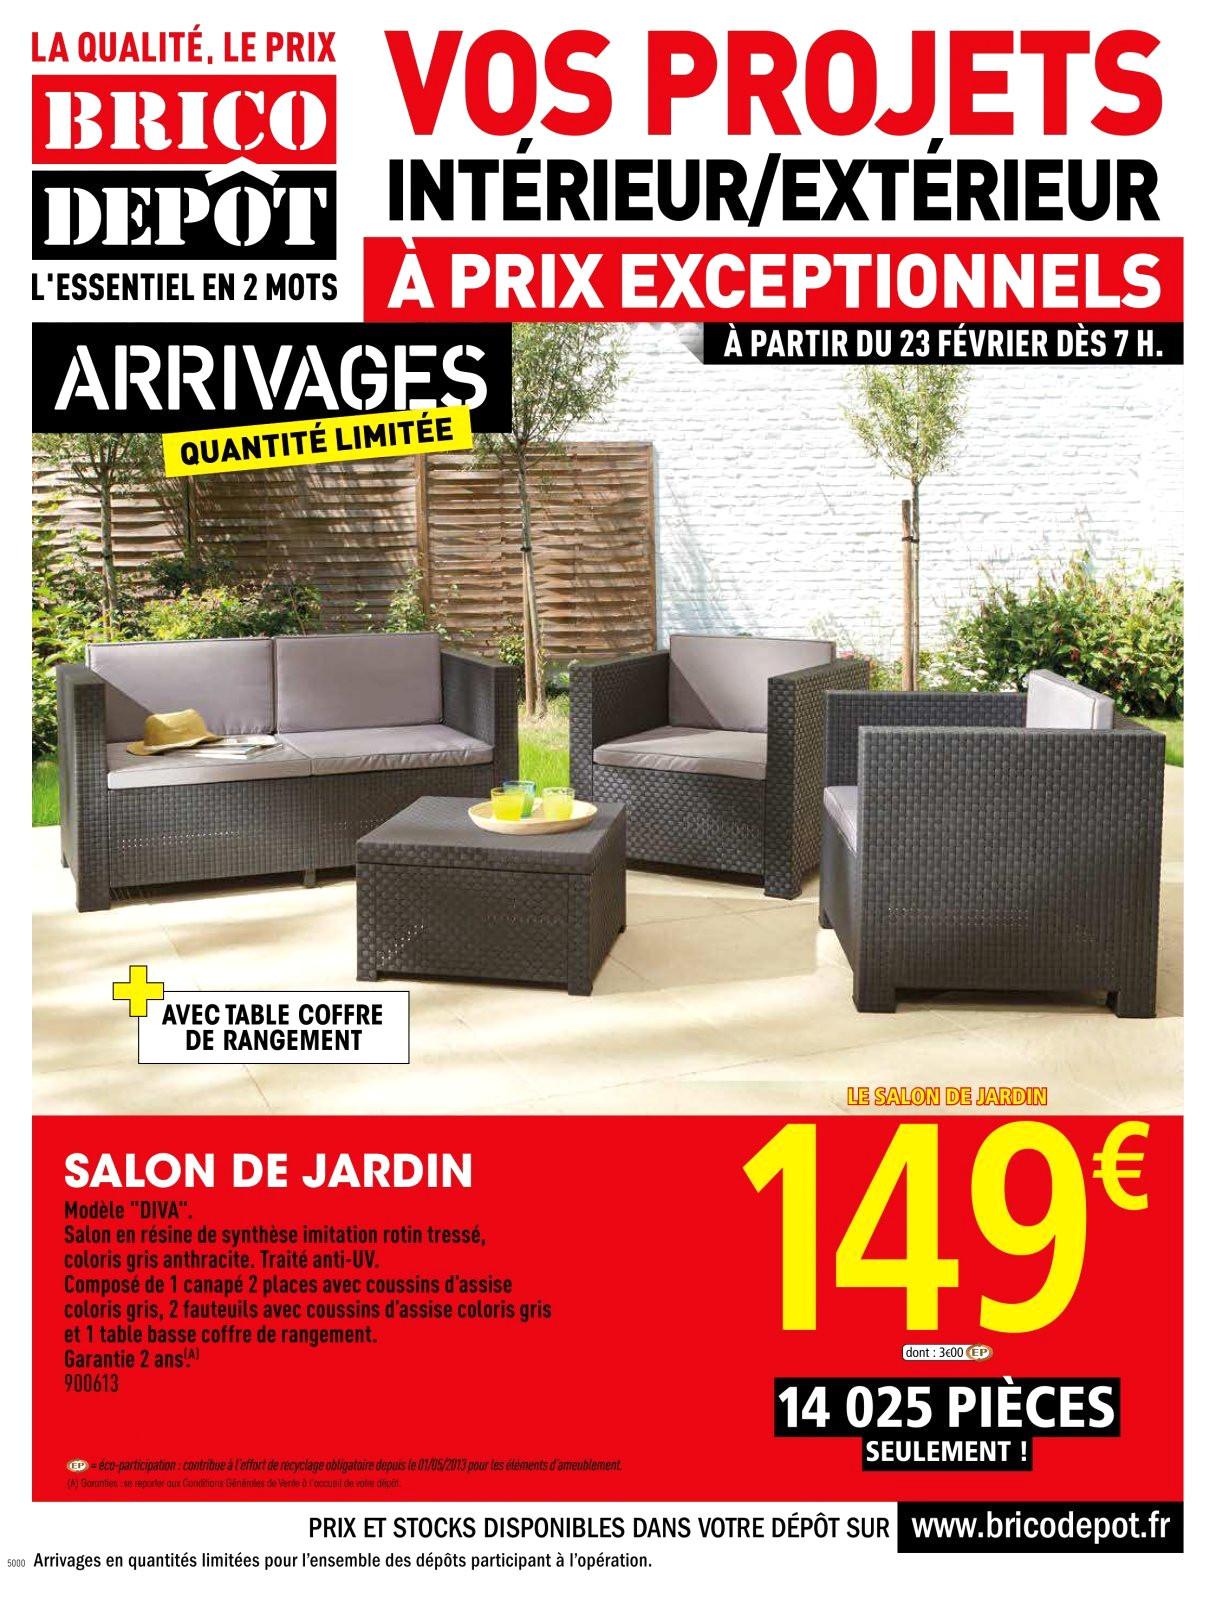 Salon de jardin brico depot - Mailleraye.fr jardin